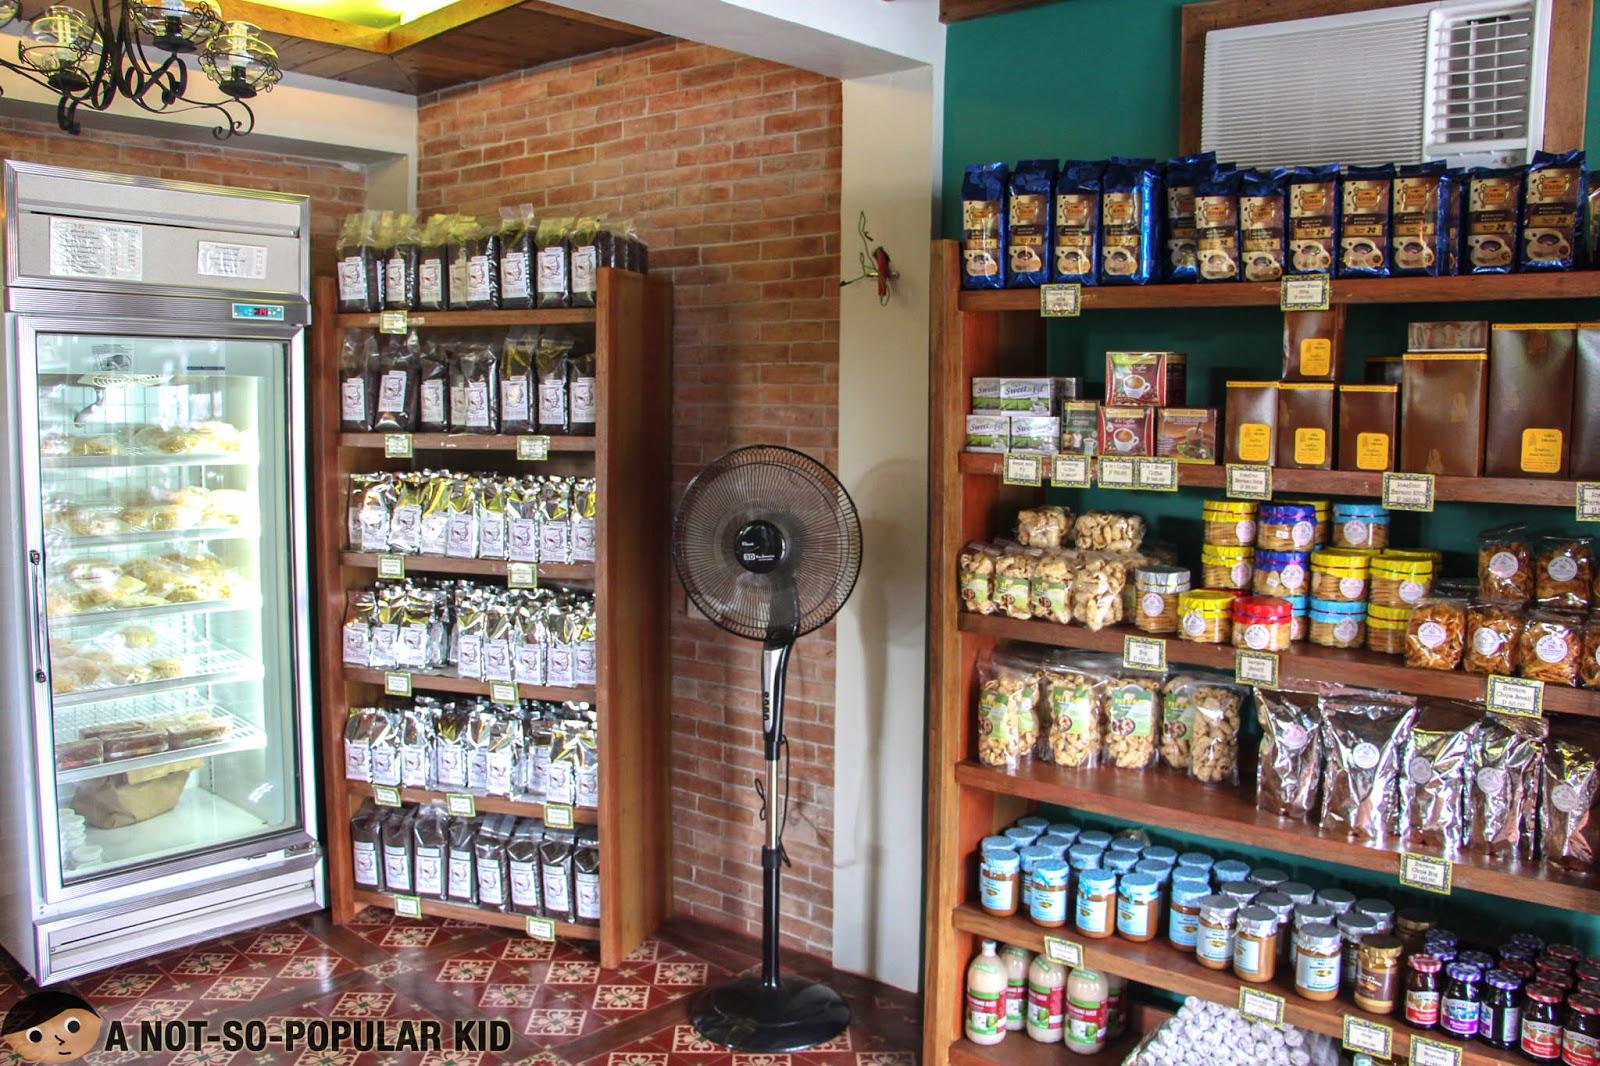 Bag of Bean's first floor housing all your pasalubong (food souvenir) needs